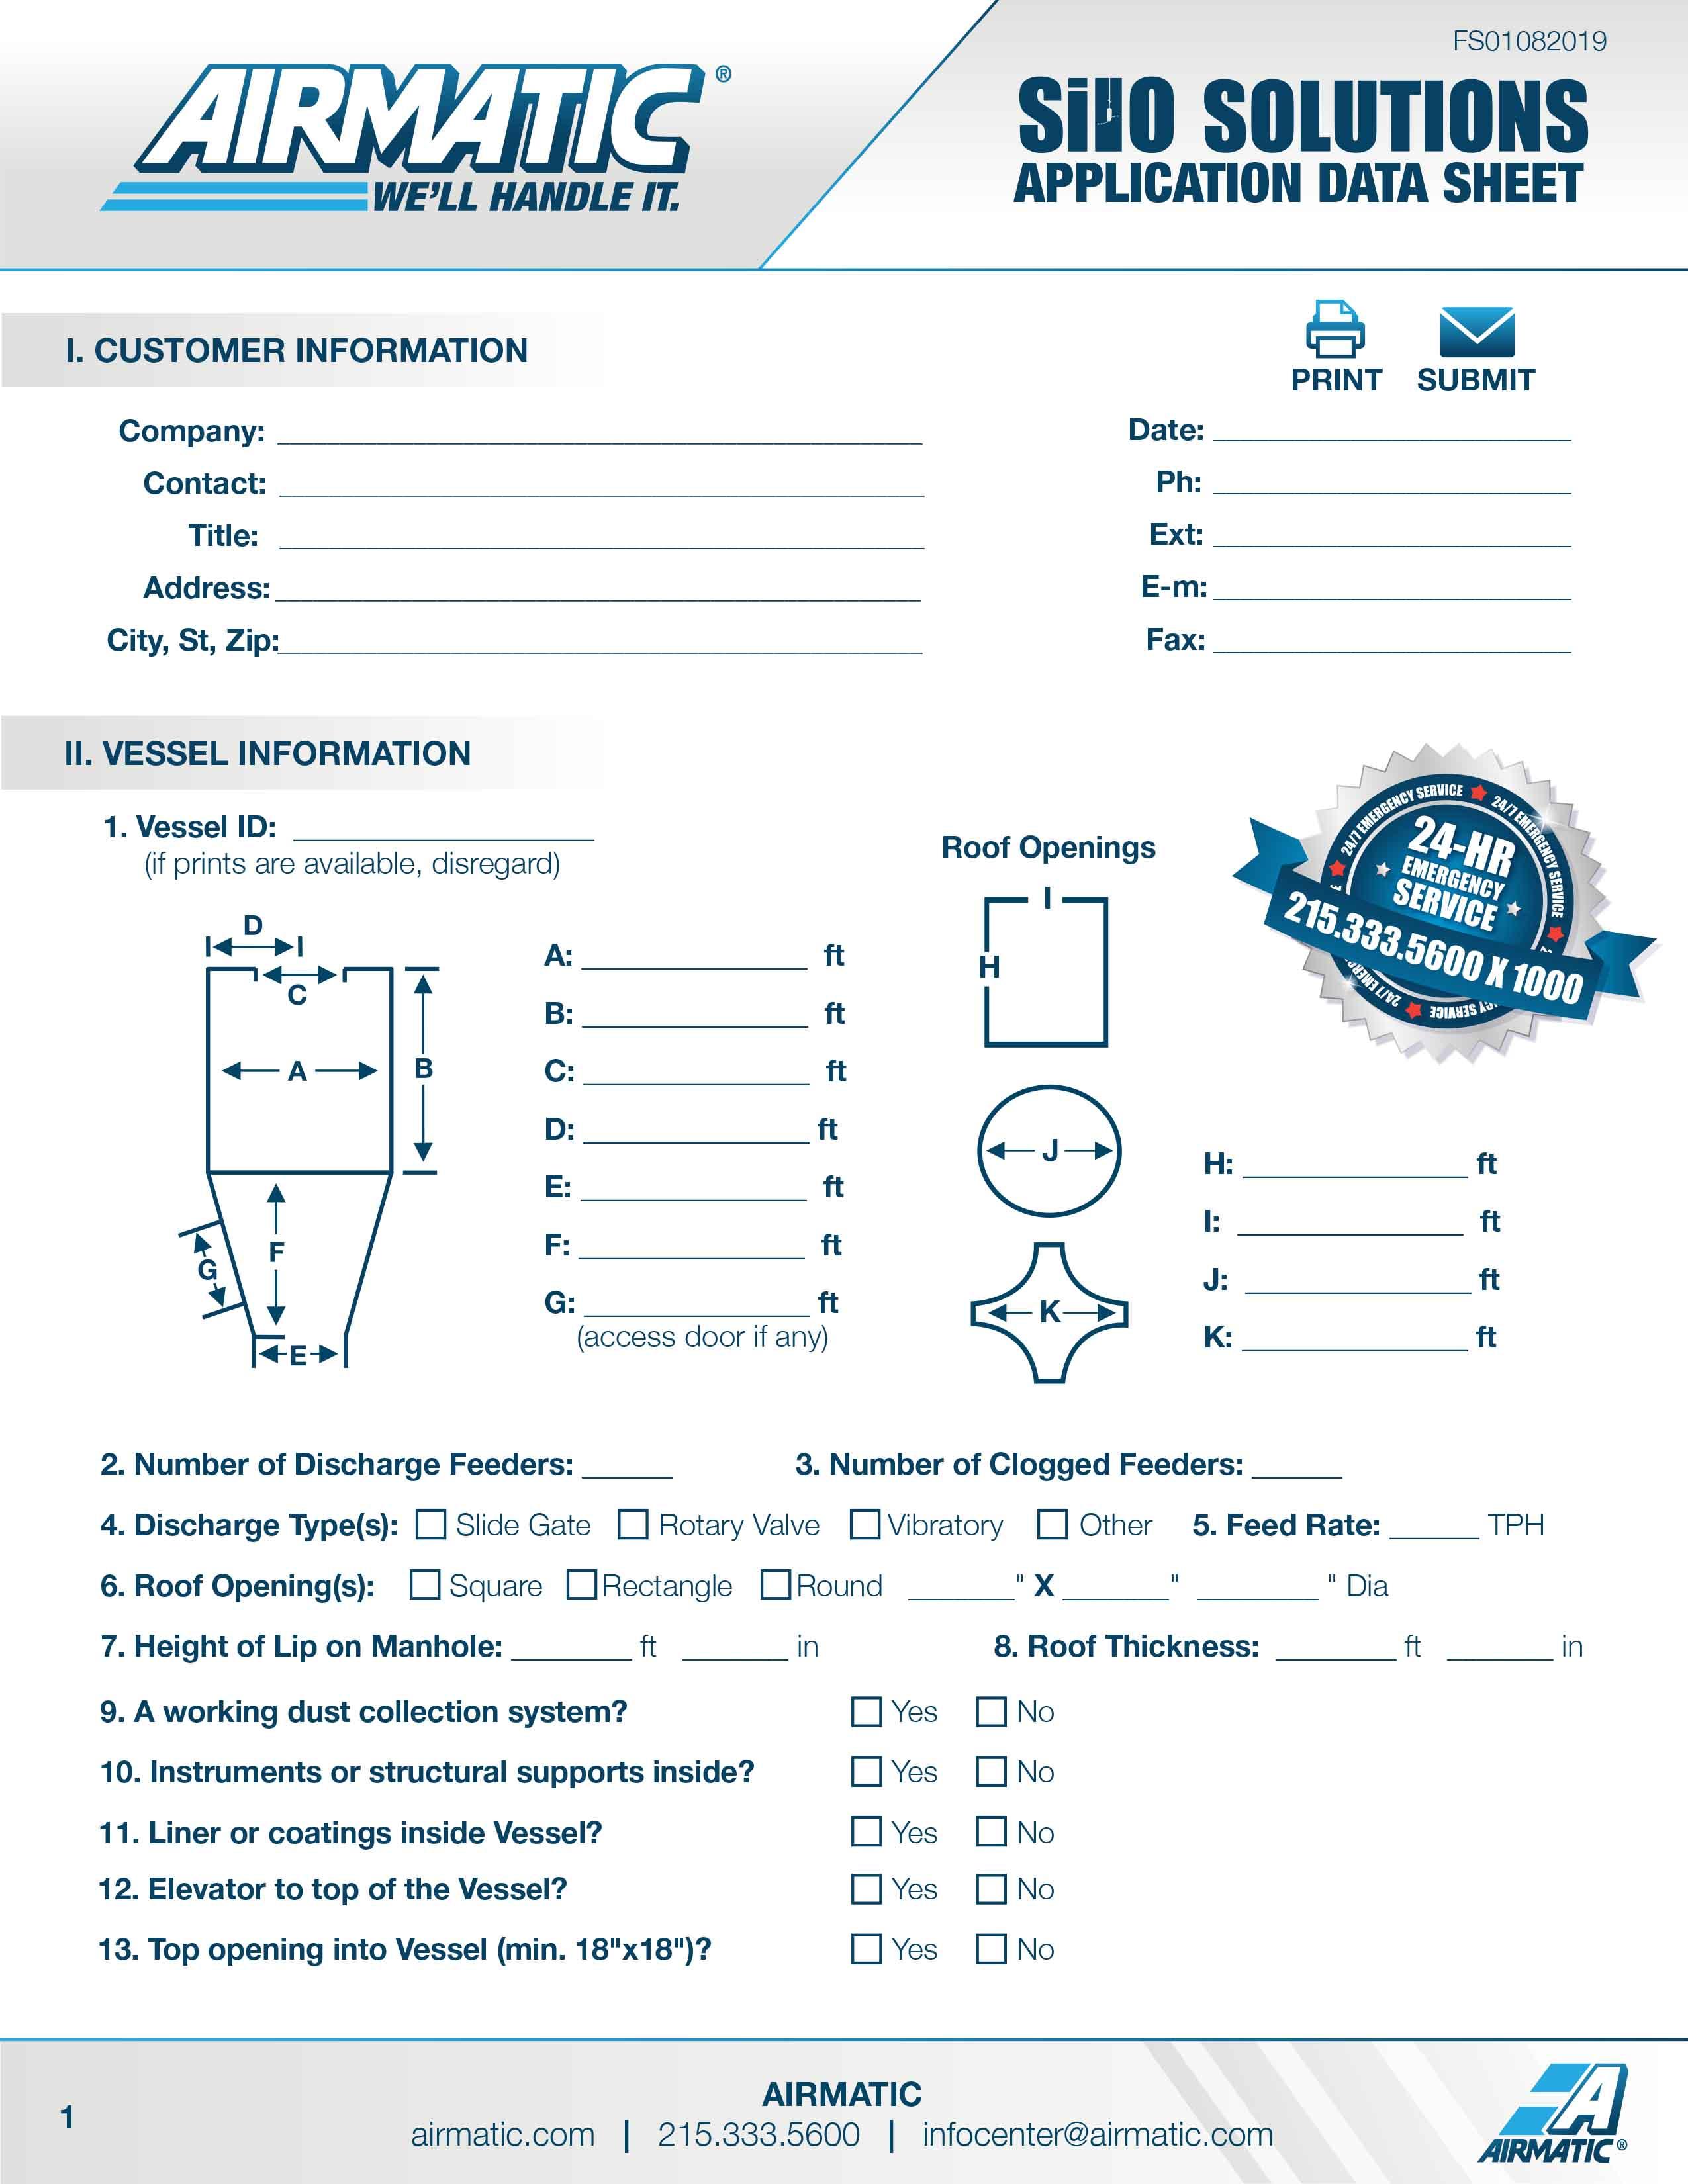 PDF-thumbnails-silocleaningdatasheet.jpg